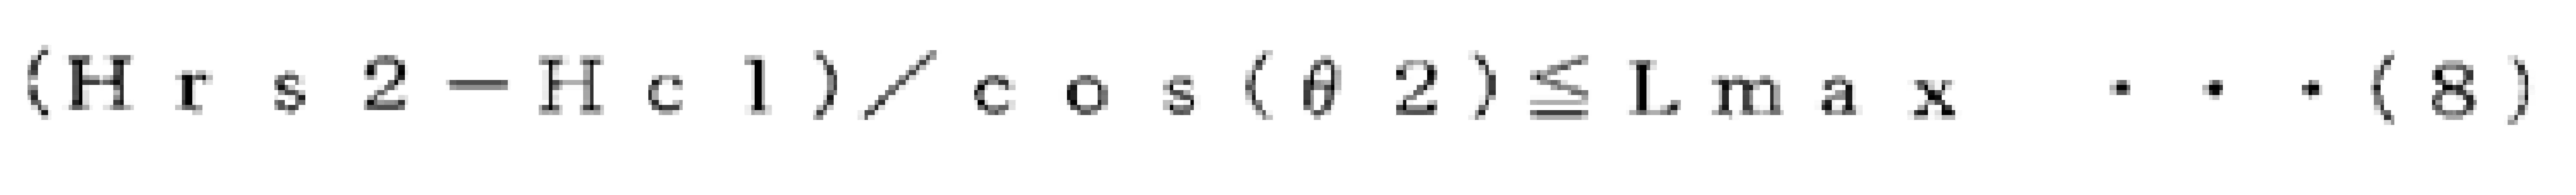 Figure 112019101508504-pct00008